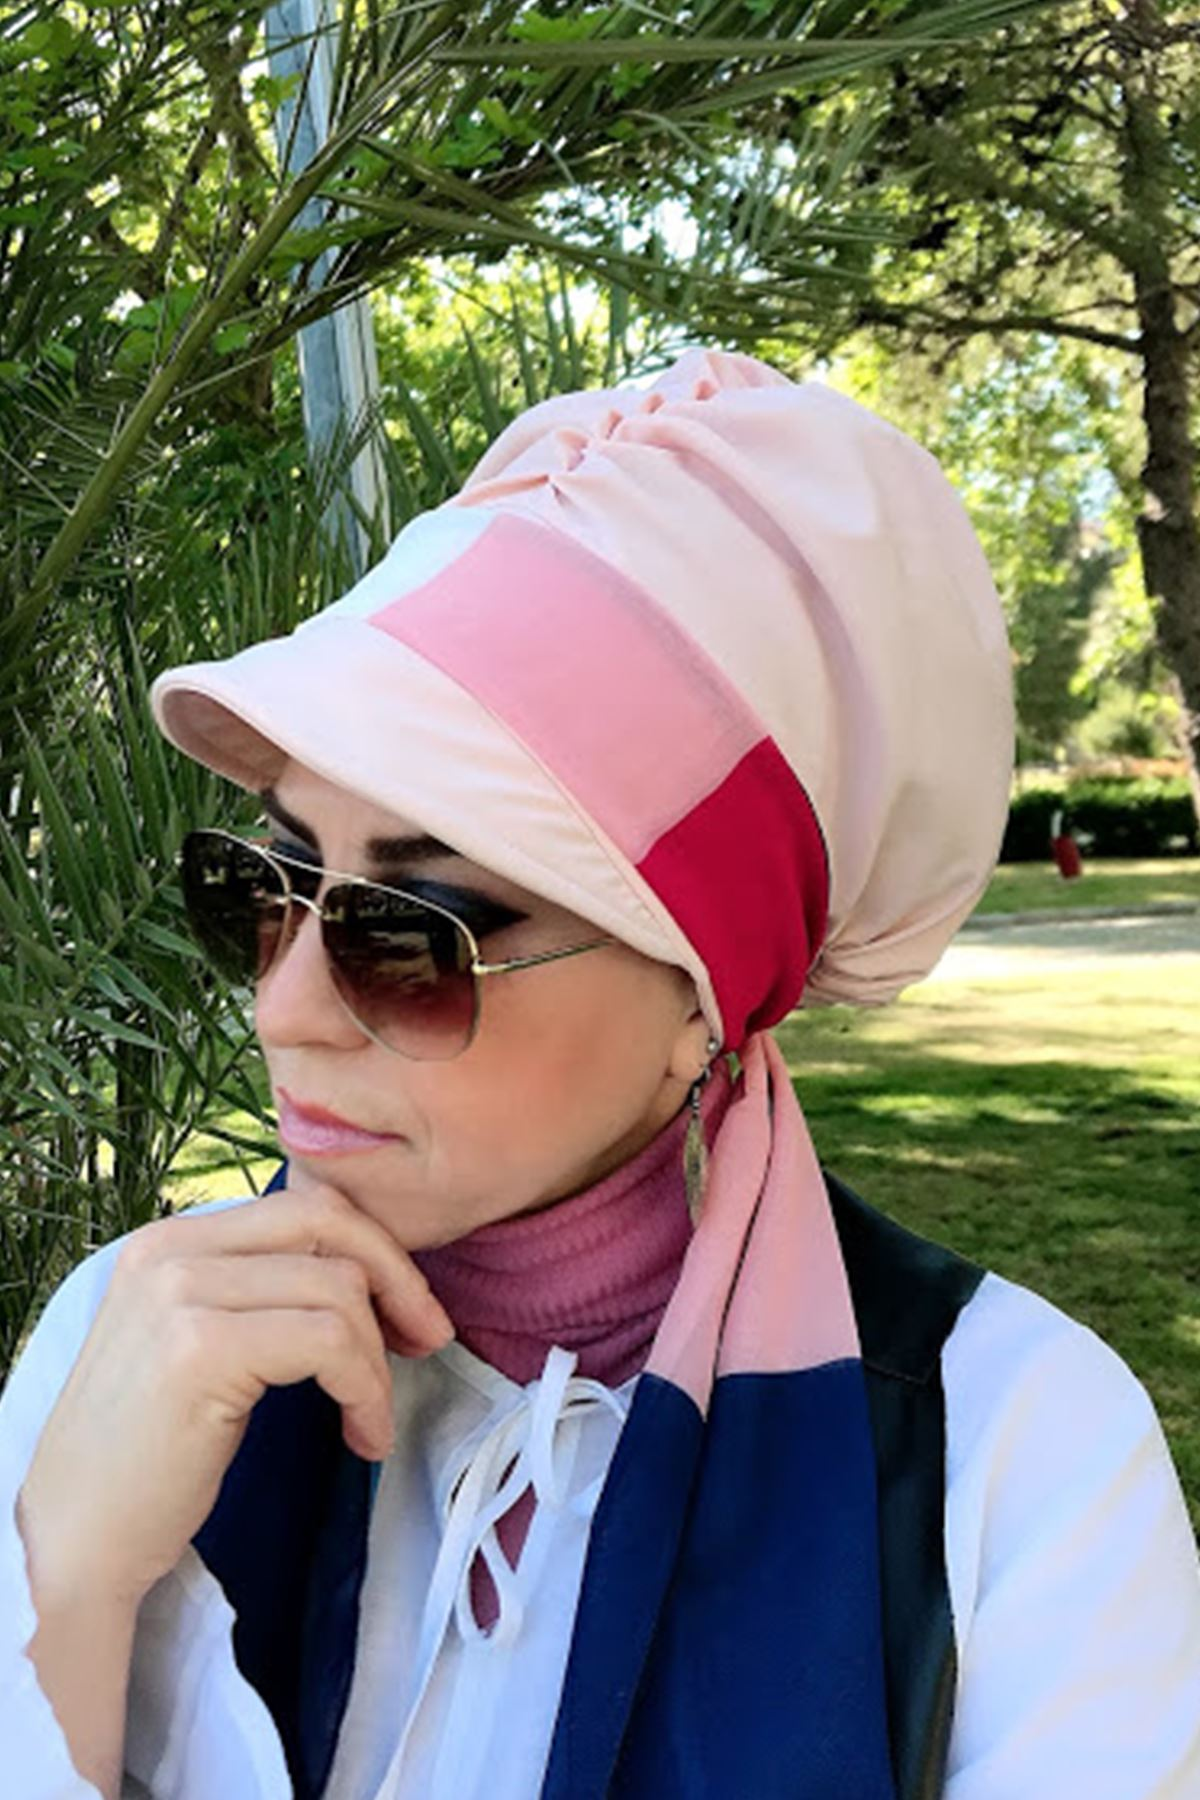 Renk Geçişli Toz Pembe Fularlı Şapka